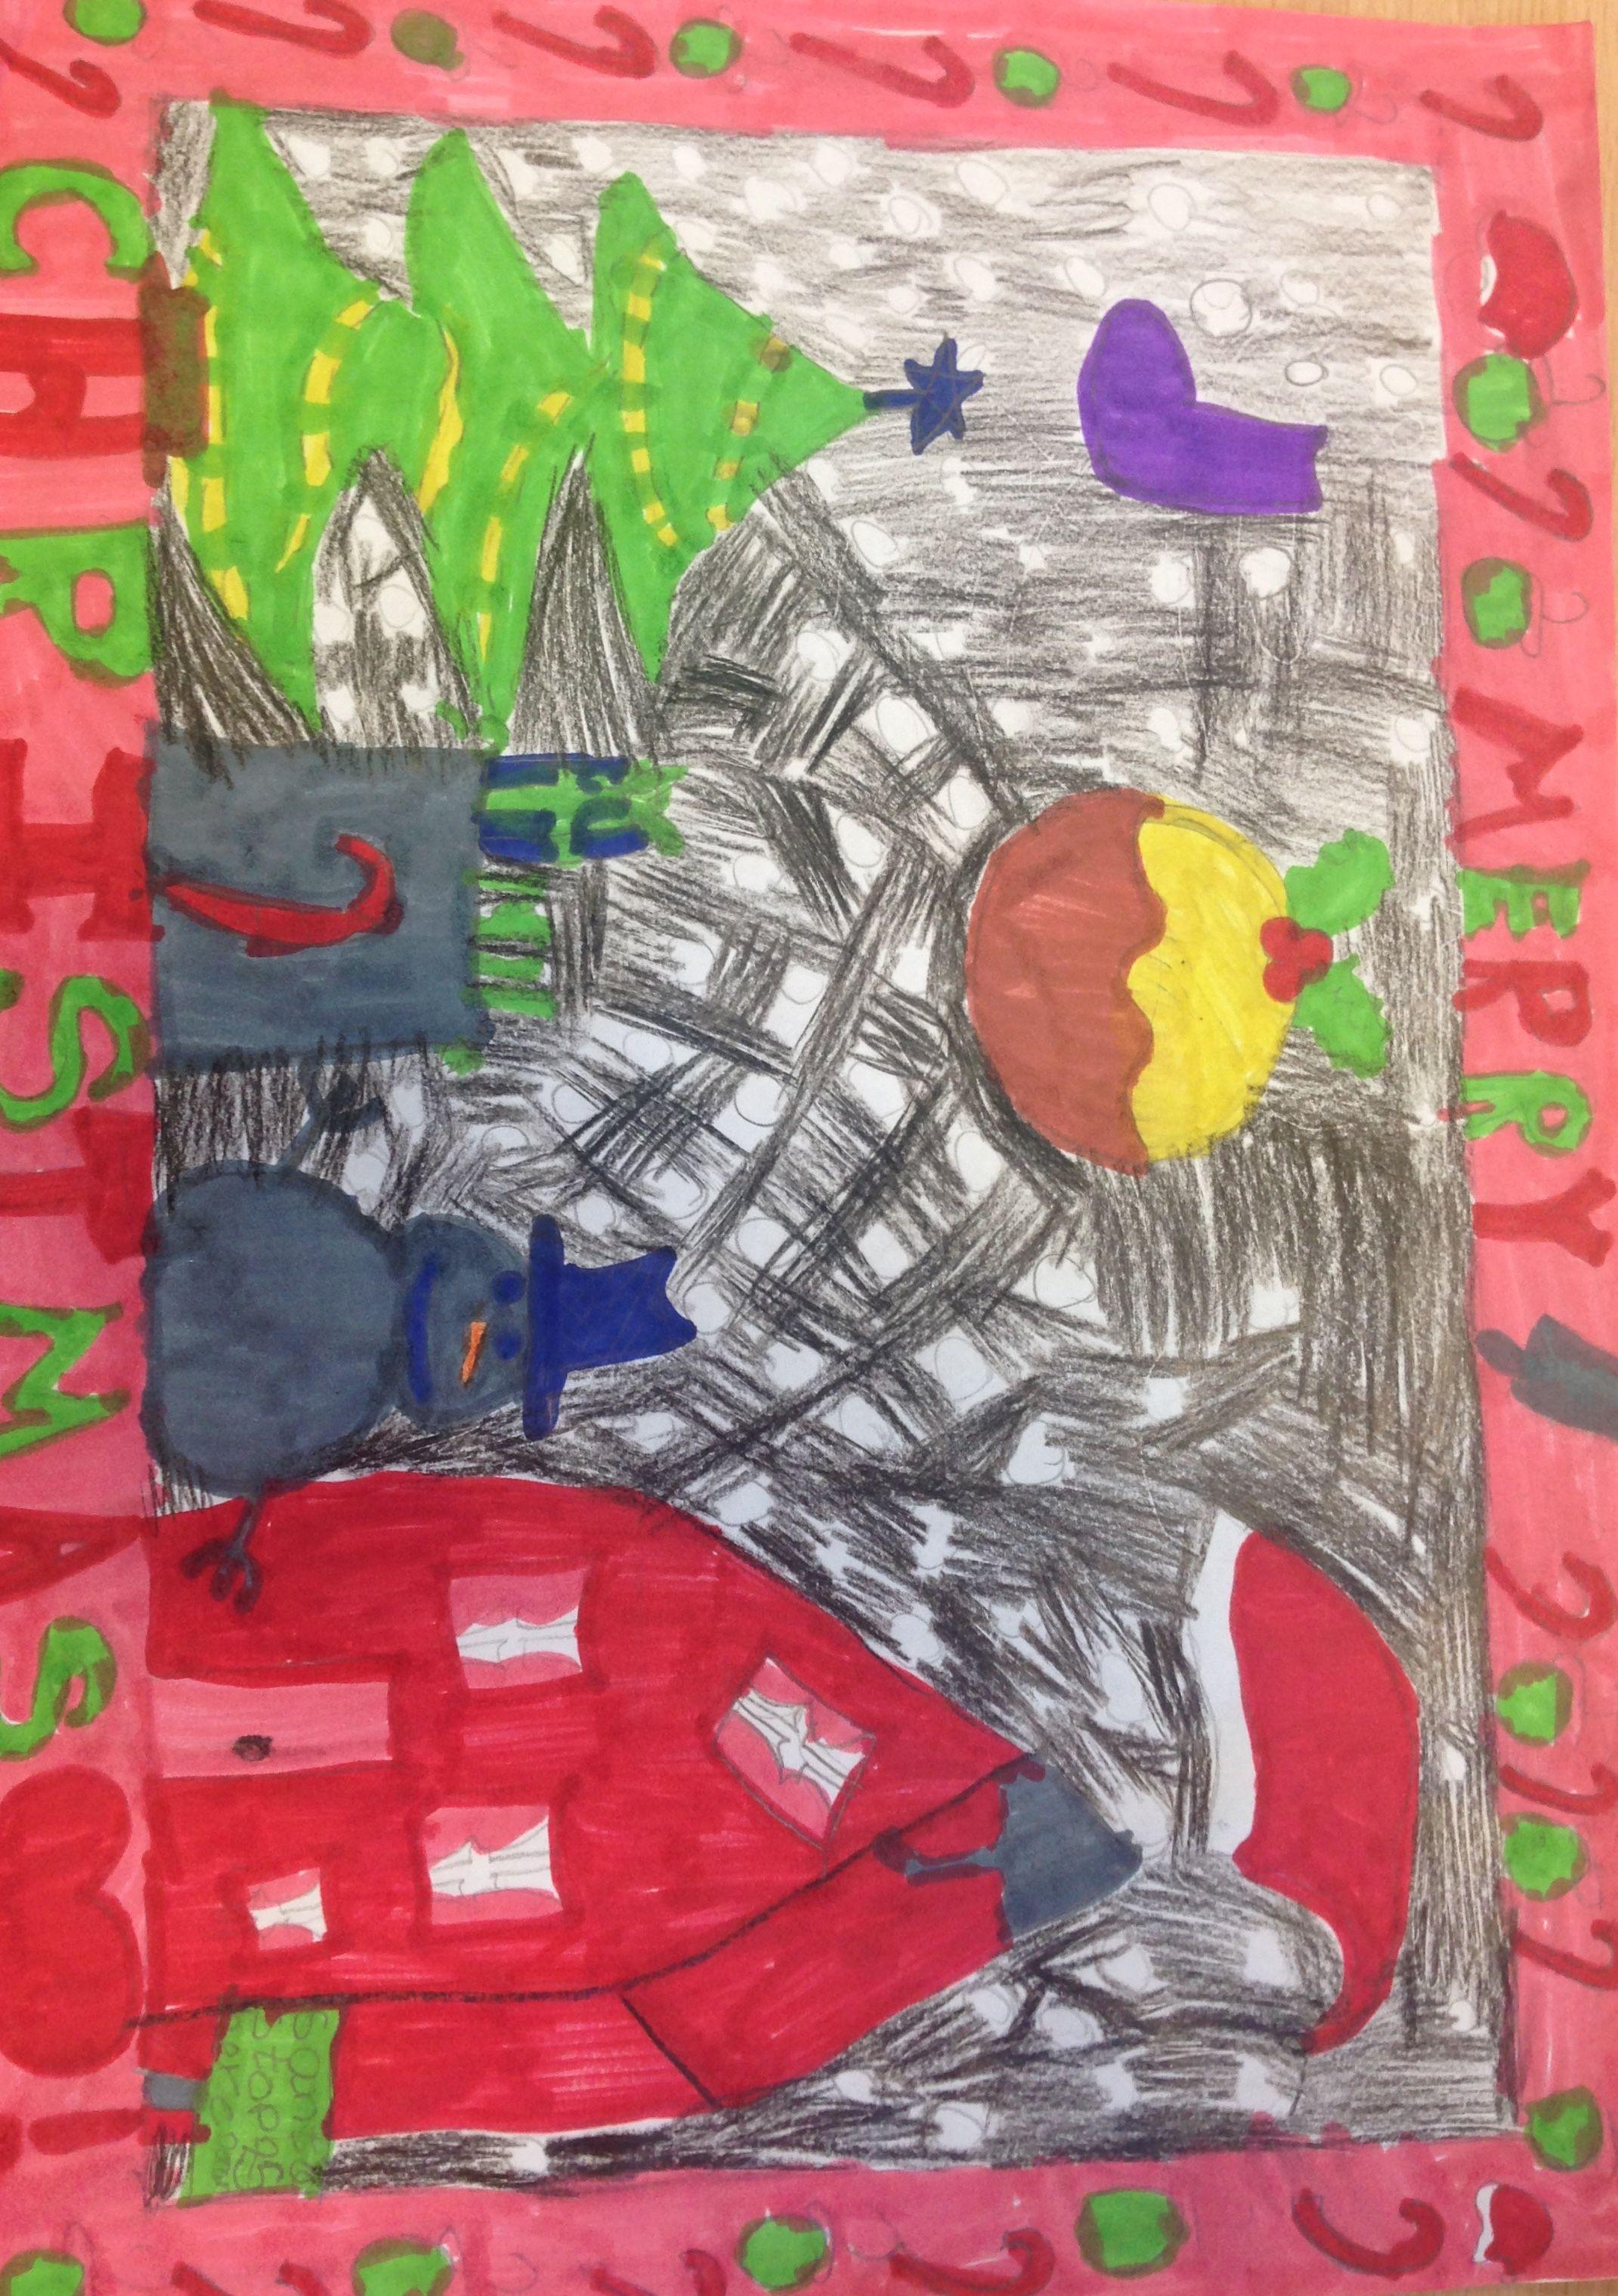 Rosie Hundrup Year 5 St Columba S Rcva Primary School